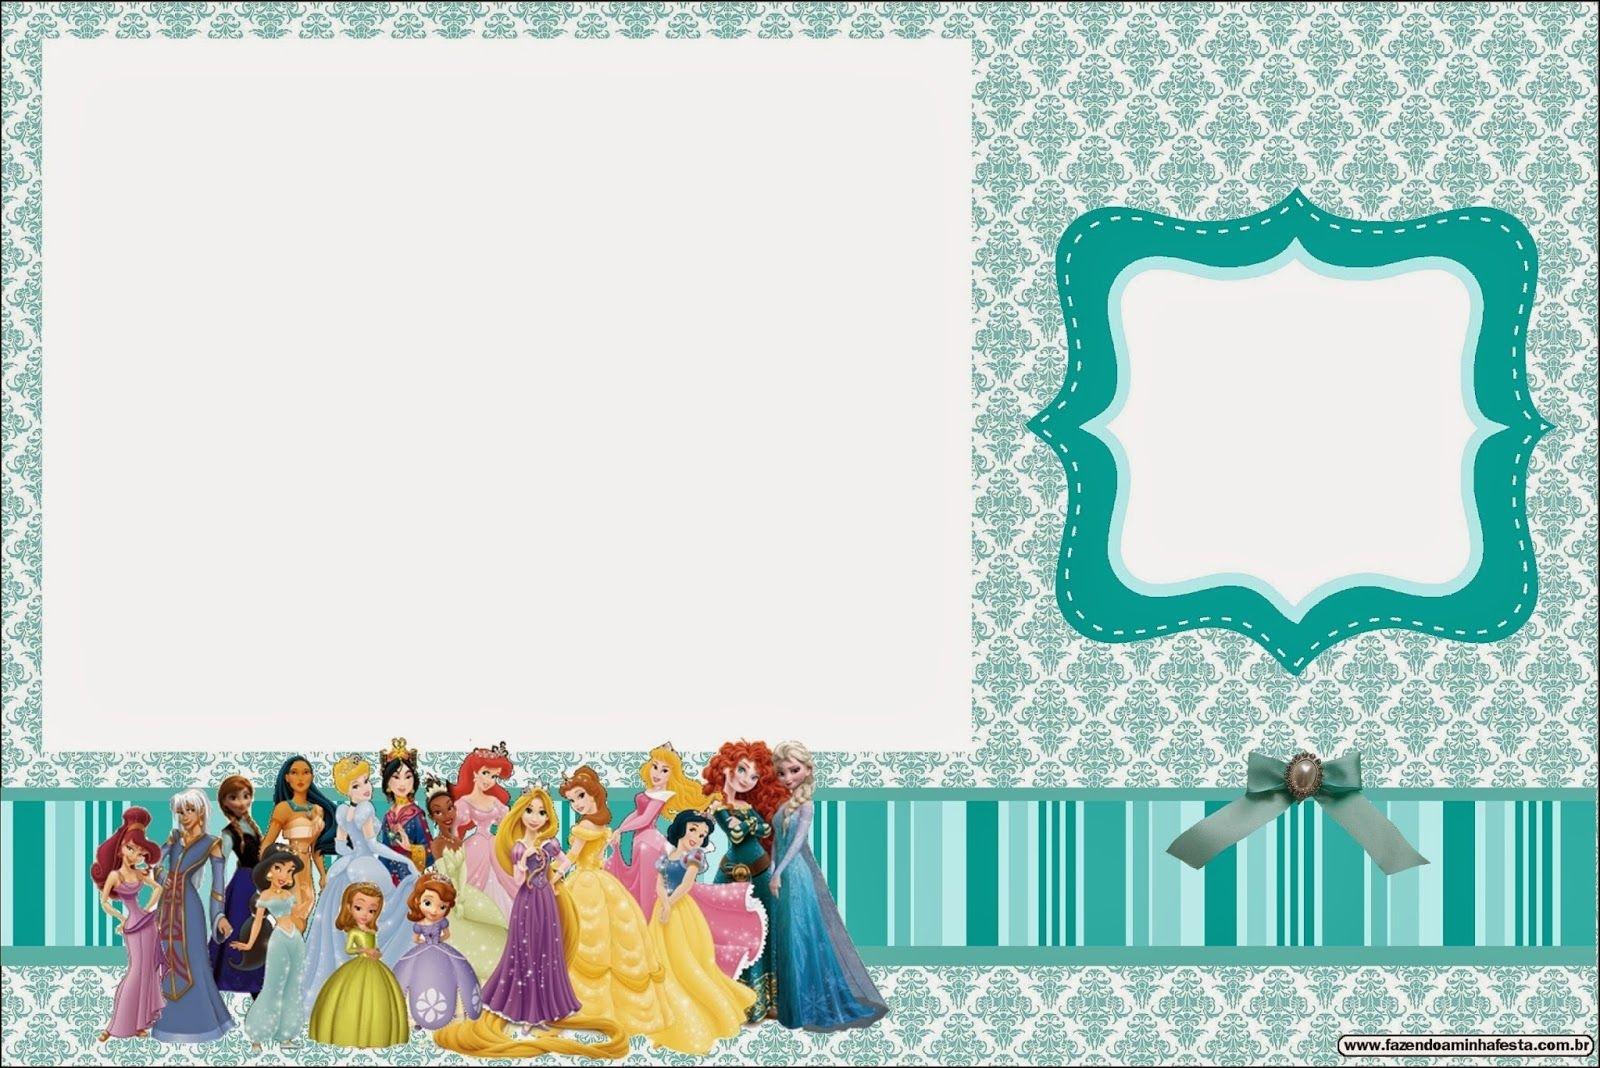 All Disney Princess: Free Printable Invitations. | Disney - Parties - Disney Princess Free Printable Invitations